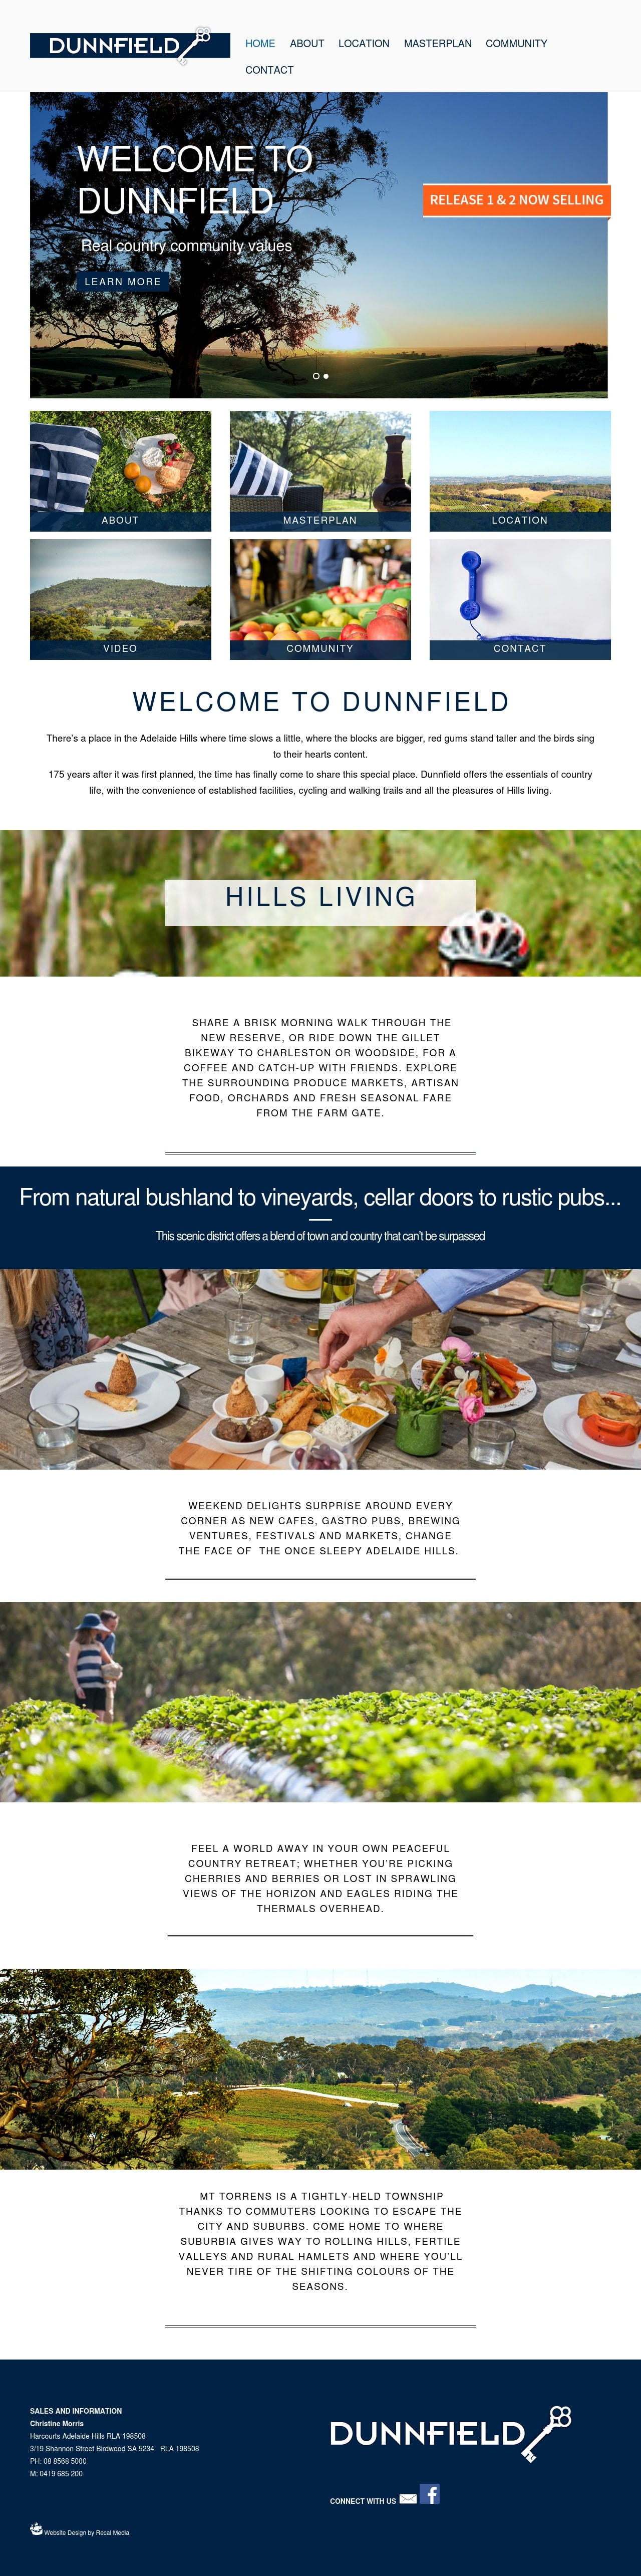 dunnfield website homepage